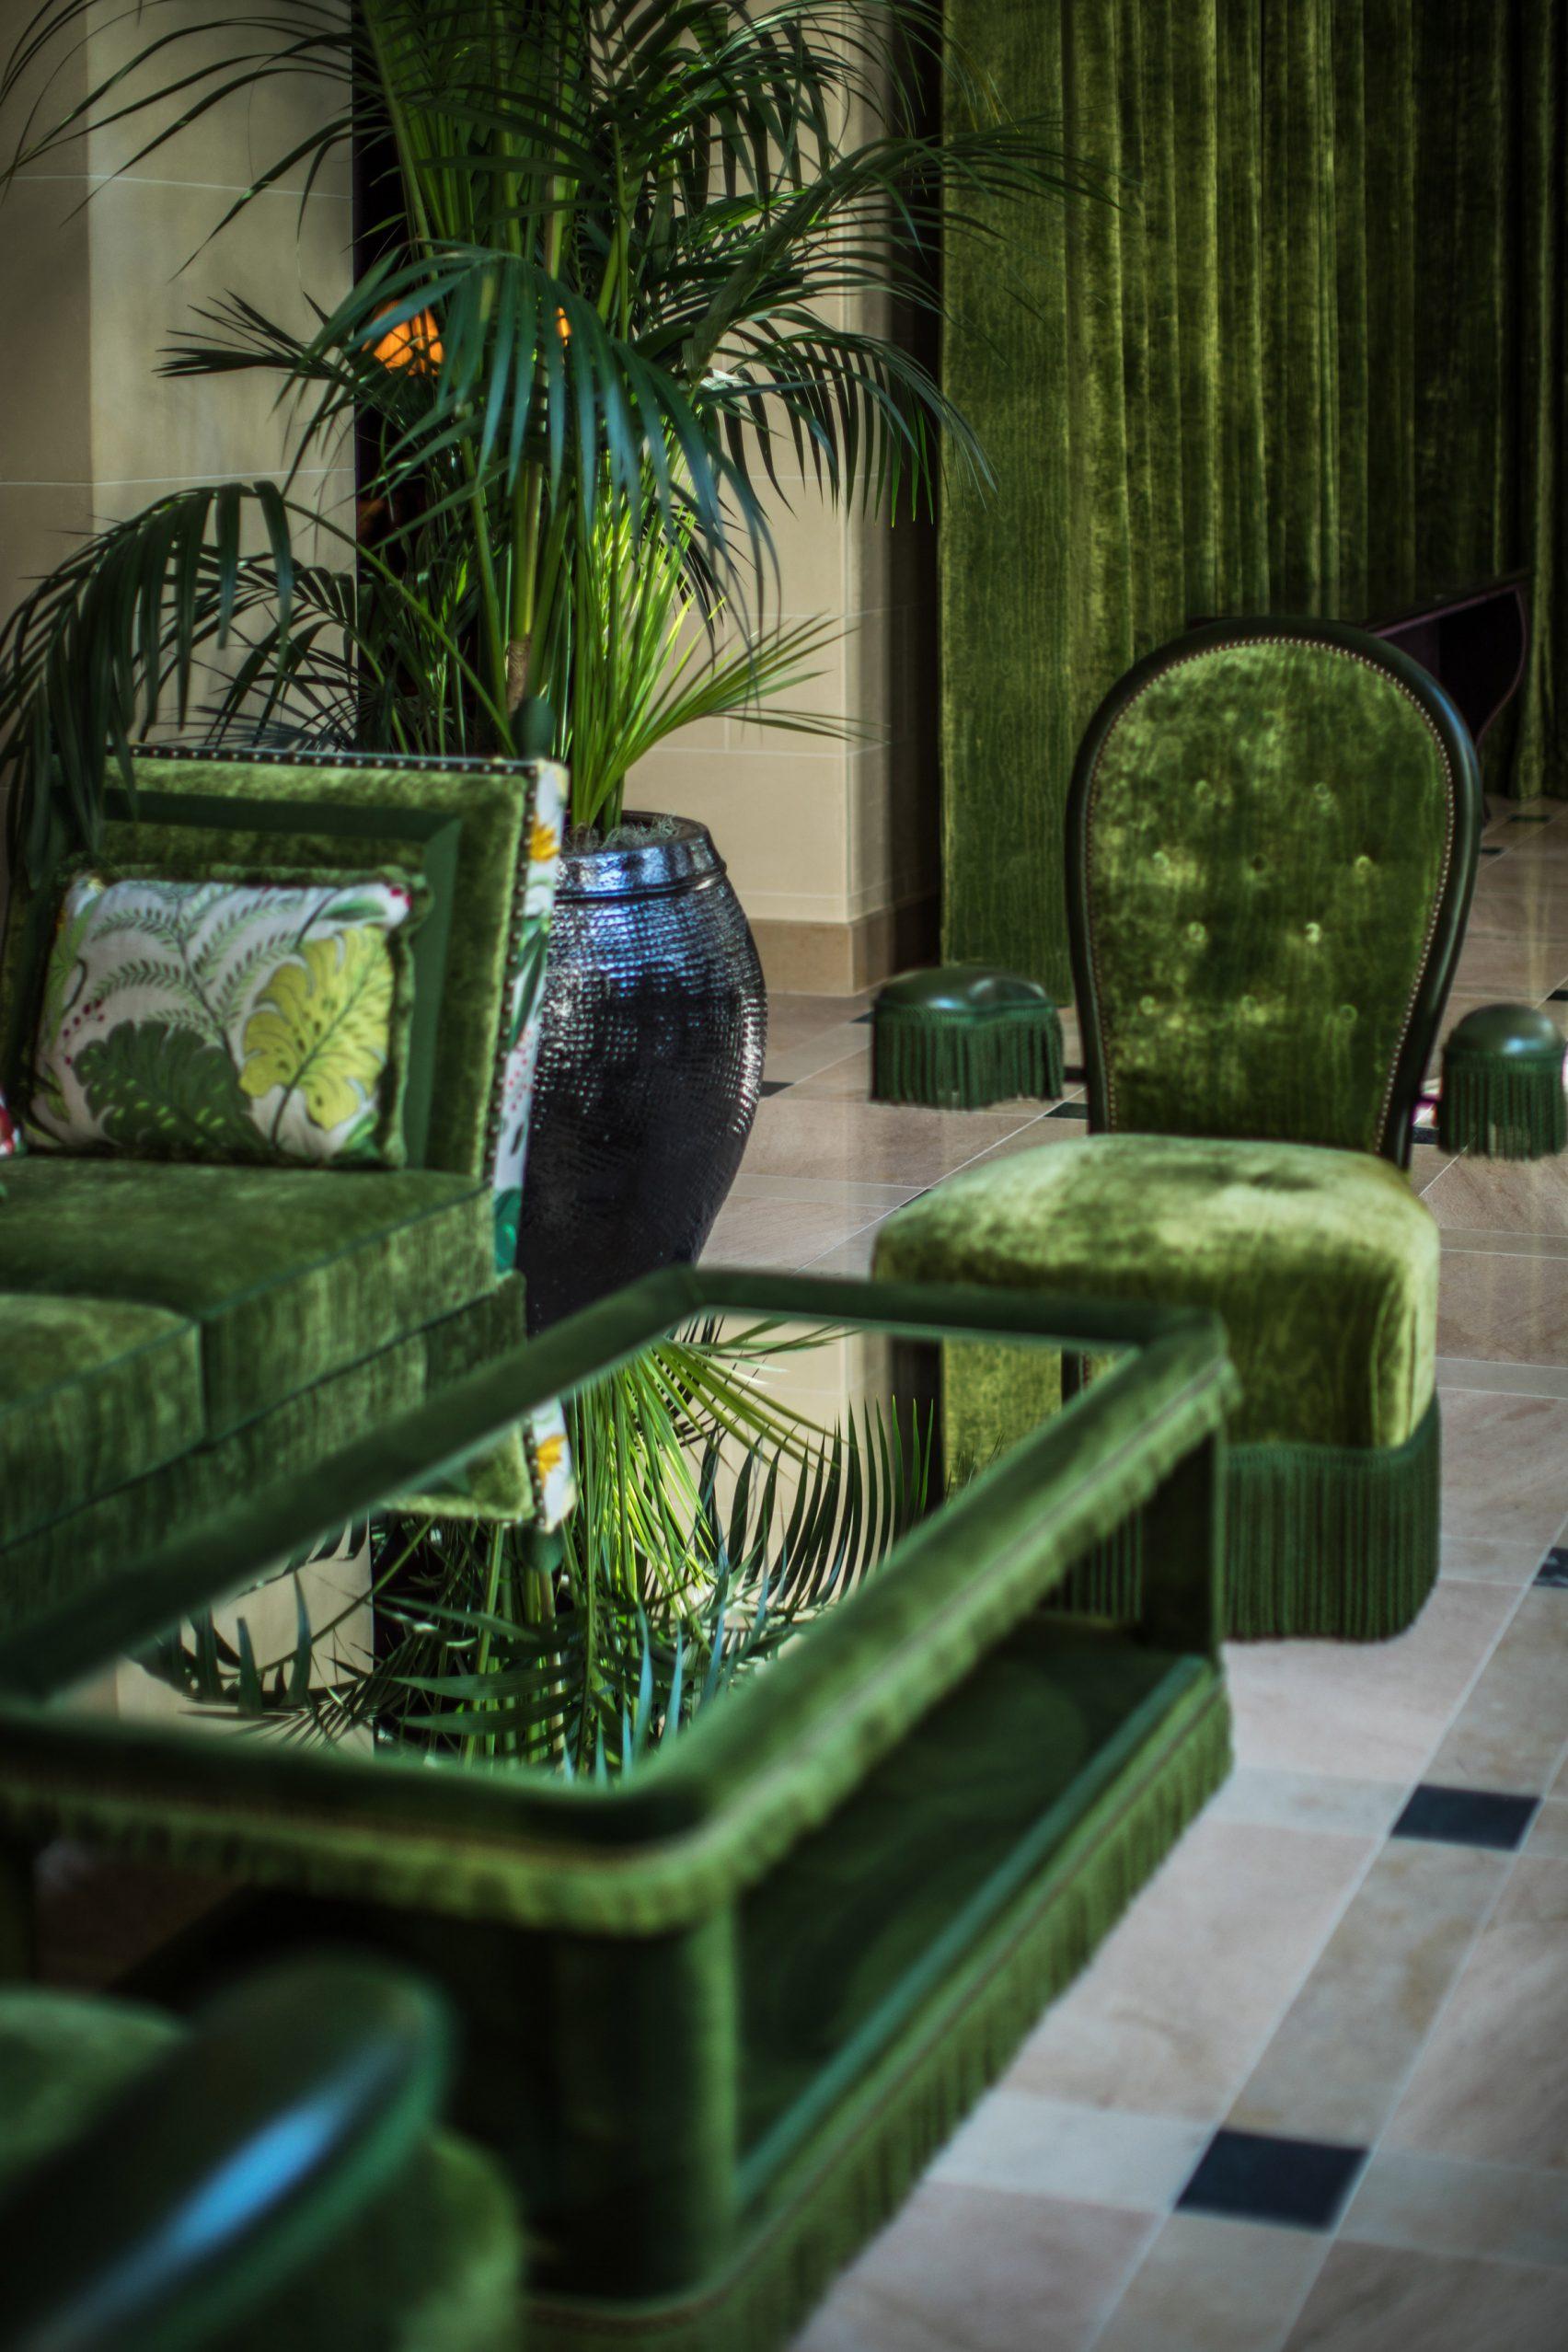 nomad-hotel-los-angeles-jacques-garcia-usa-interiors_dezeen_2364_col_13-1704x2556